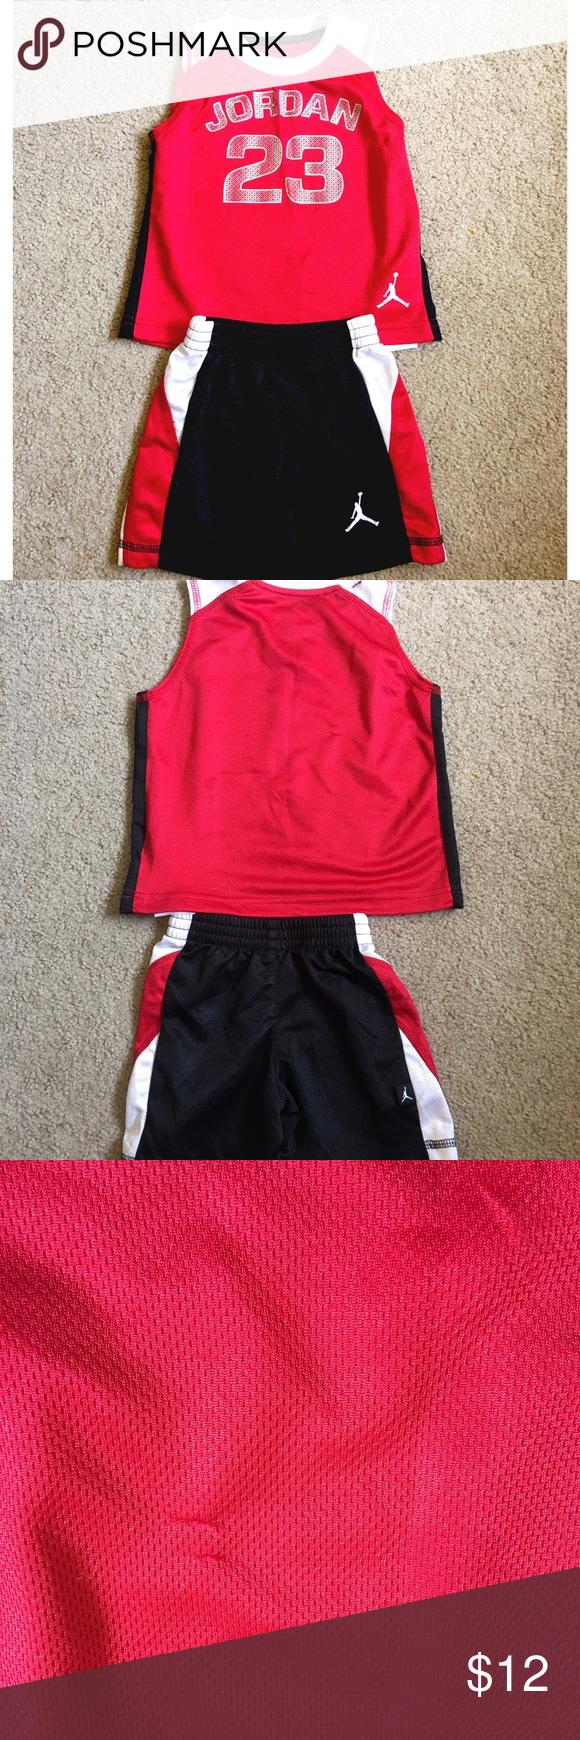 88d1e183ea0f10 ✨BOYS NIKE BASKETBALL OUTFIT✨ Boys NIKE AIR JORDAN basketball outfit. Tank  top and